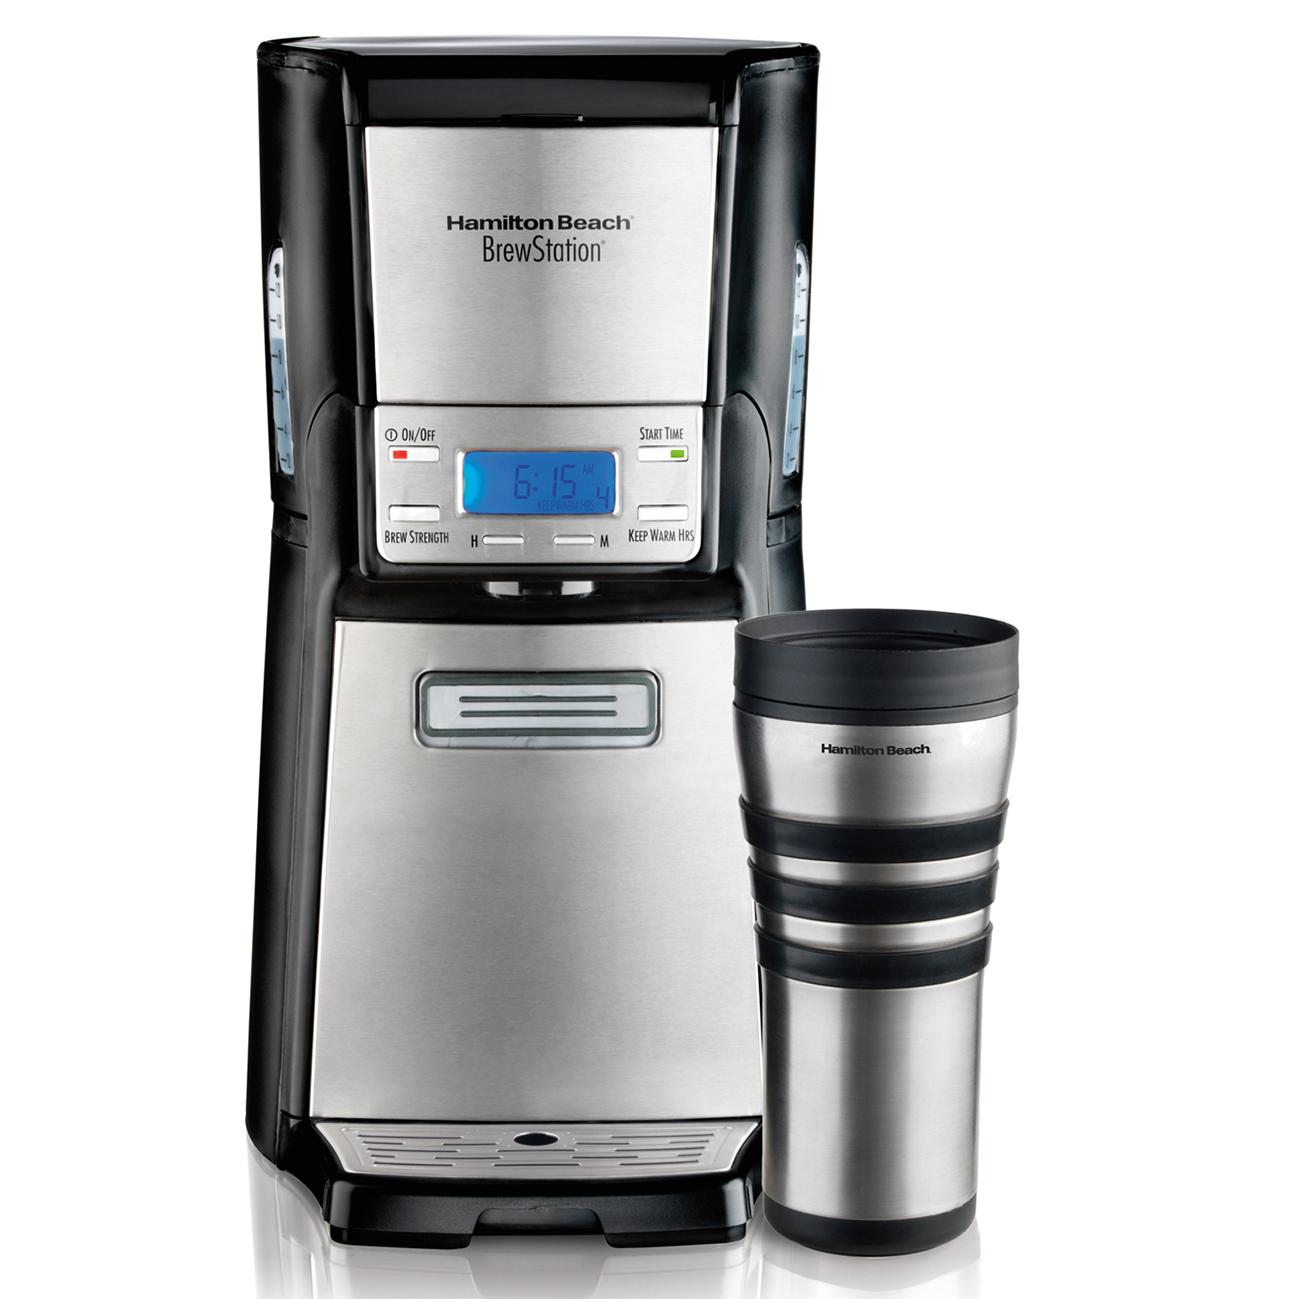 Coffee Maker Without Auto Shut Off : Hamilton Beach 48465 Brewstation Summit Ultra 12-Cup Programmable Coffeemaker